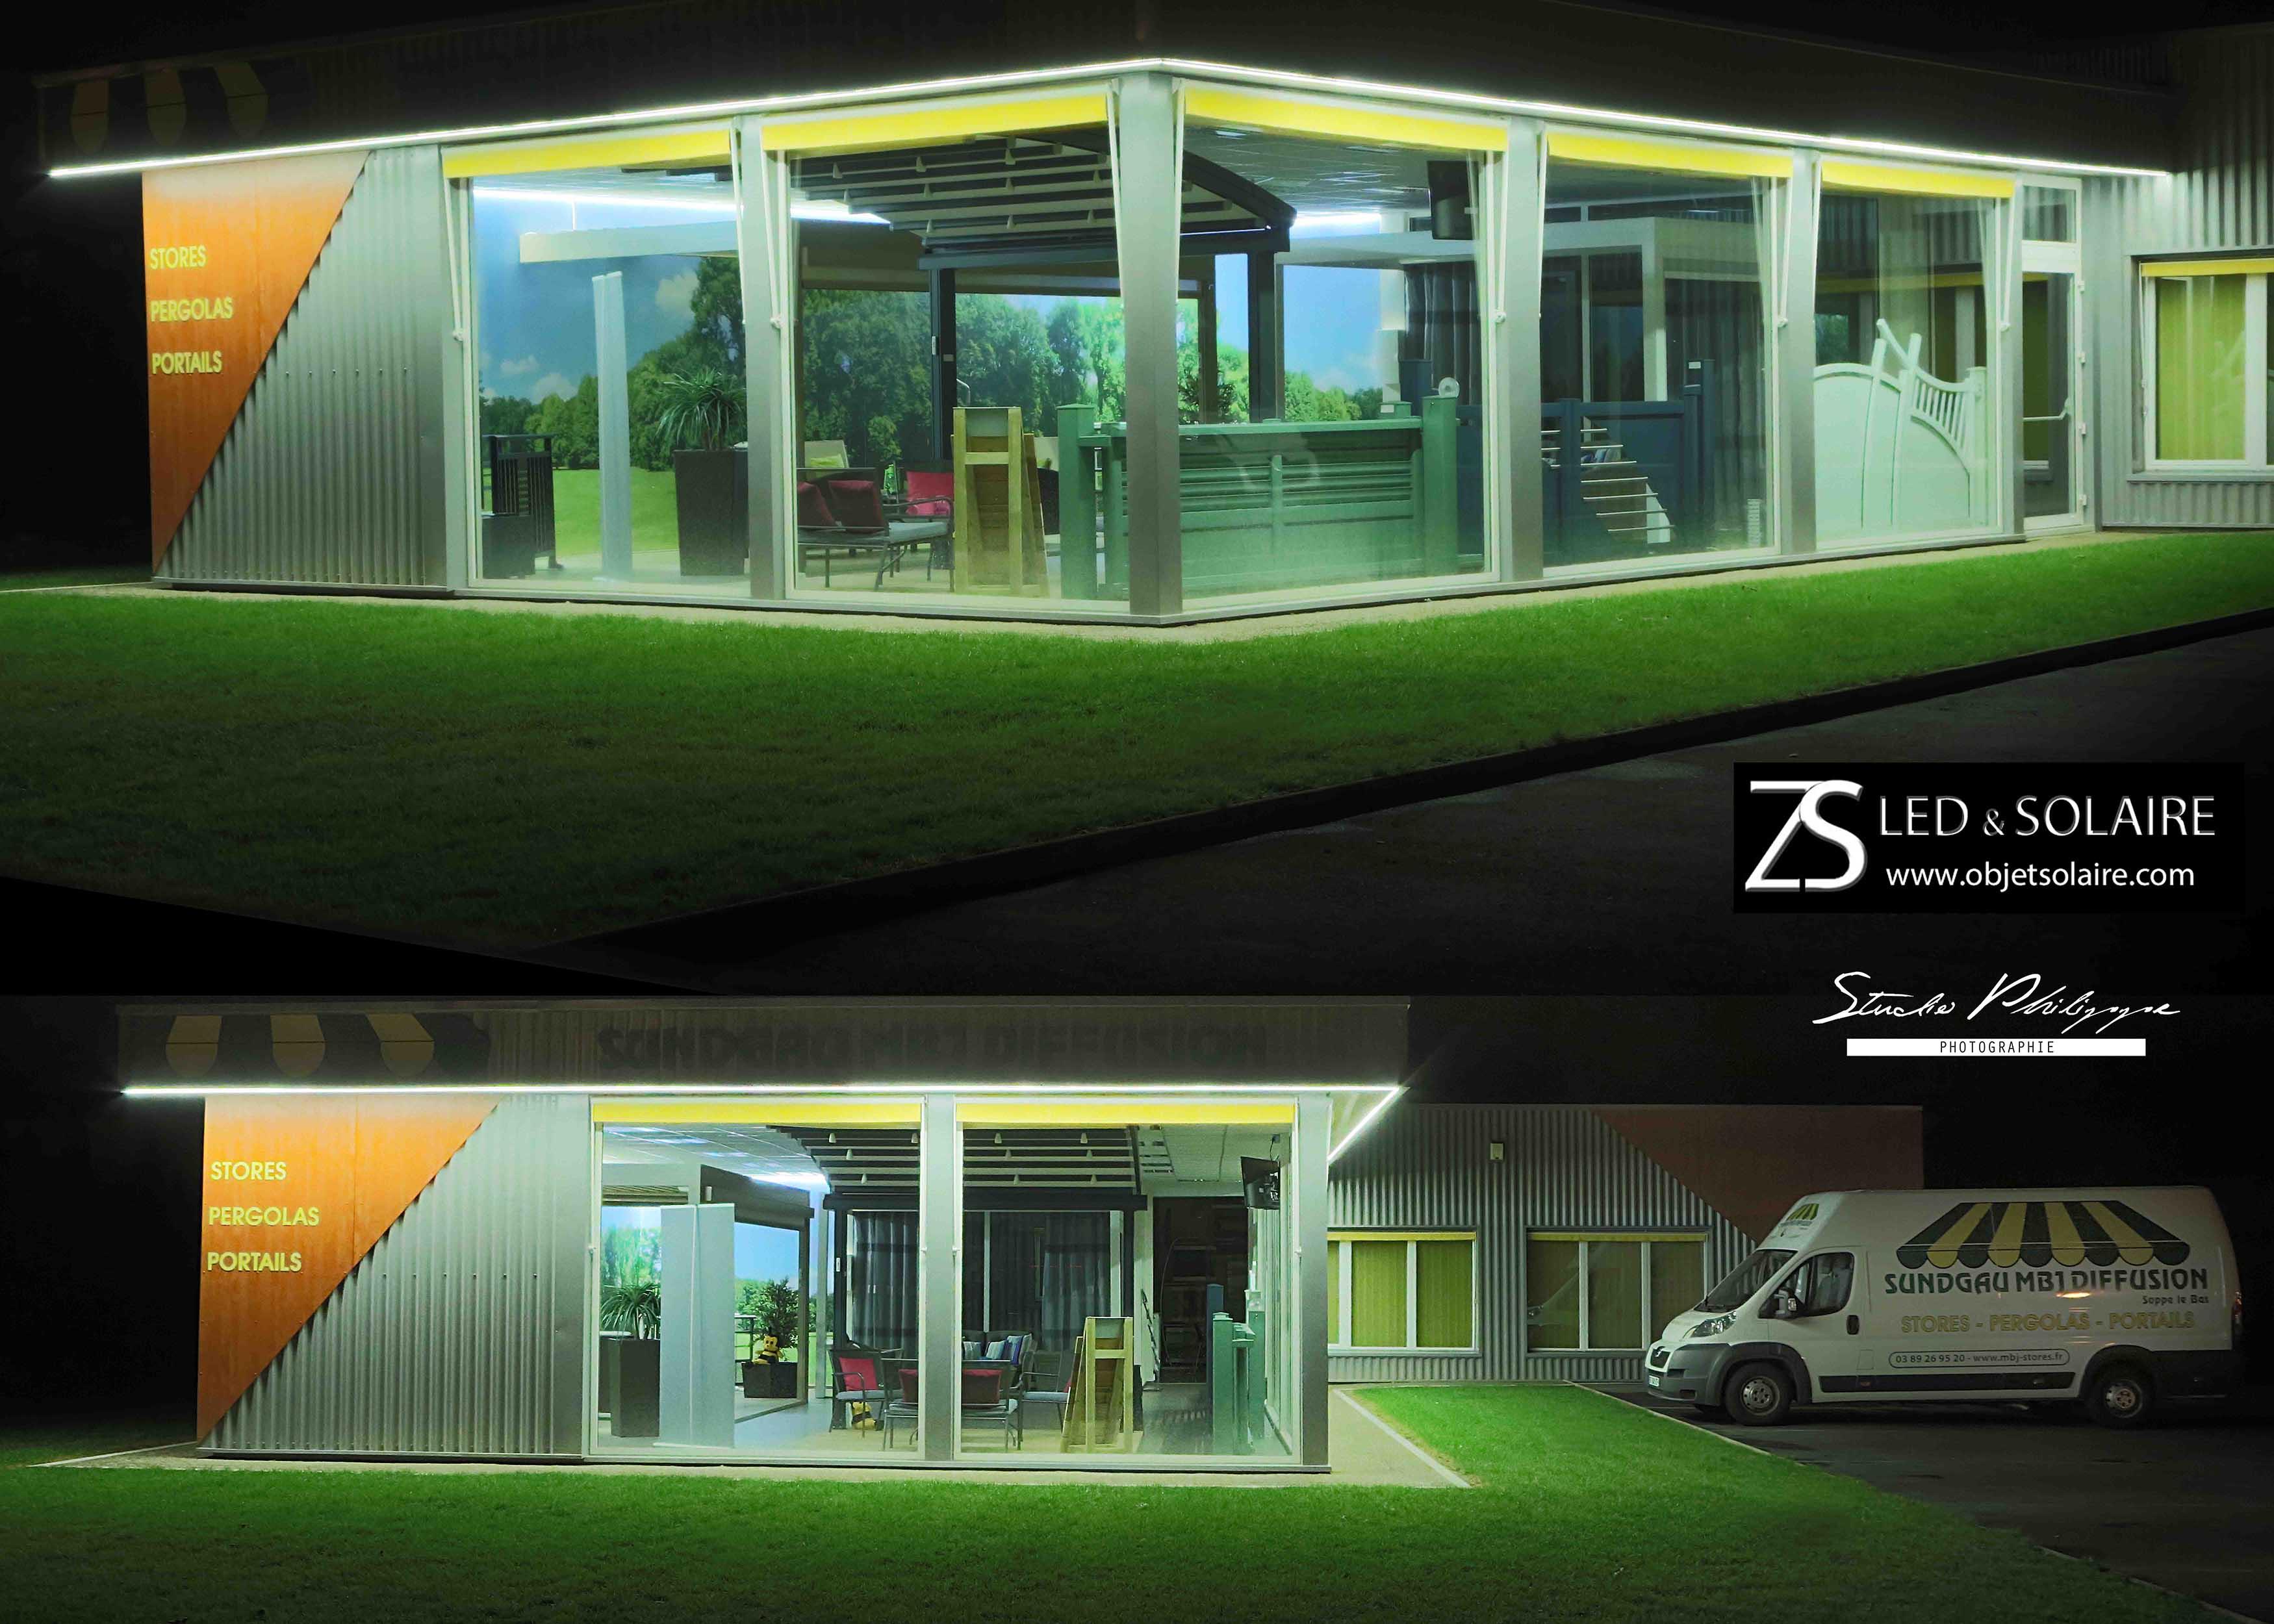 profil aluminium ruban led en u 2 m tres eclairage led objetsolaire. Black Bedroom Furniture Sets. Home Design Ideas